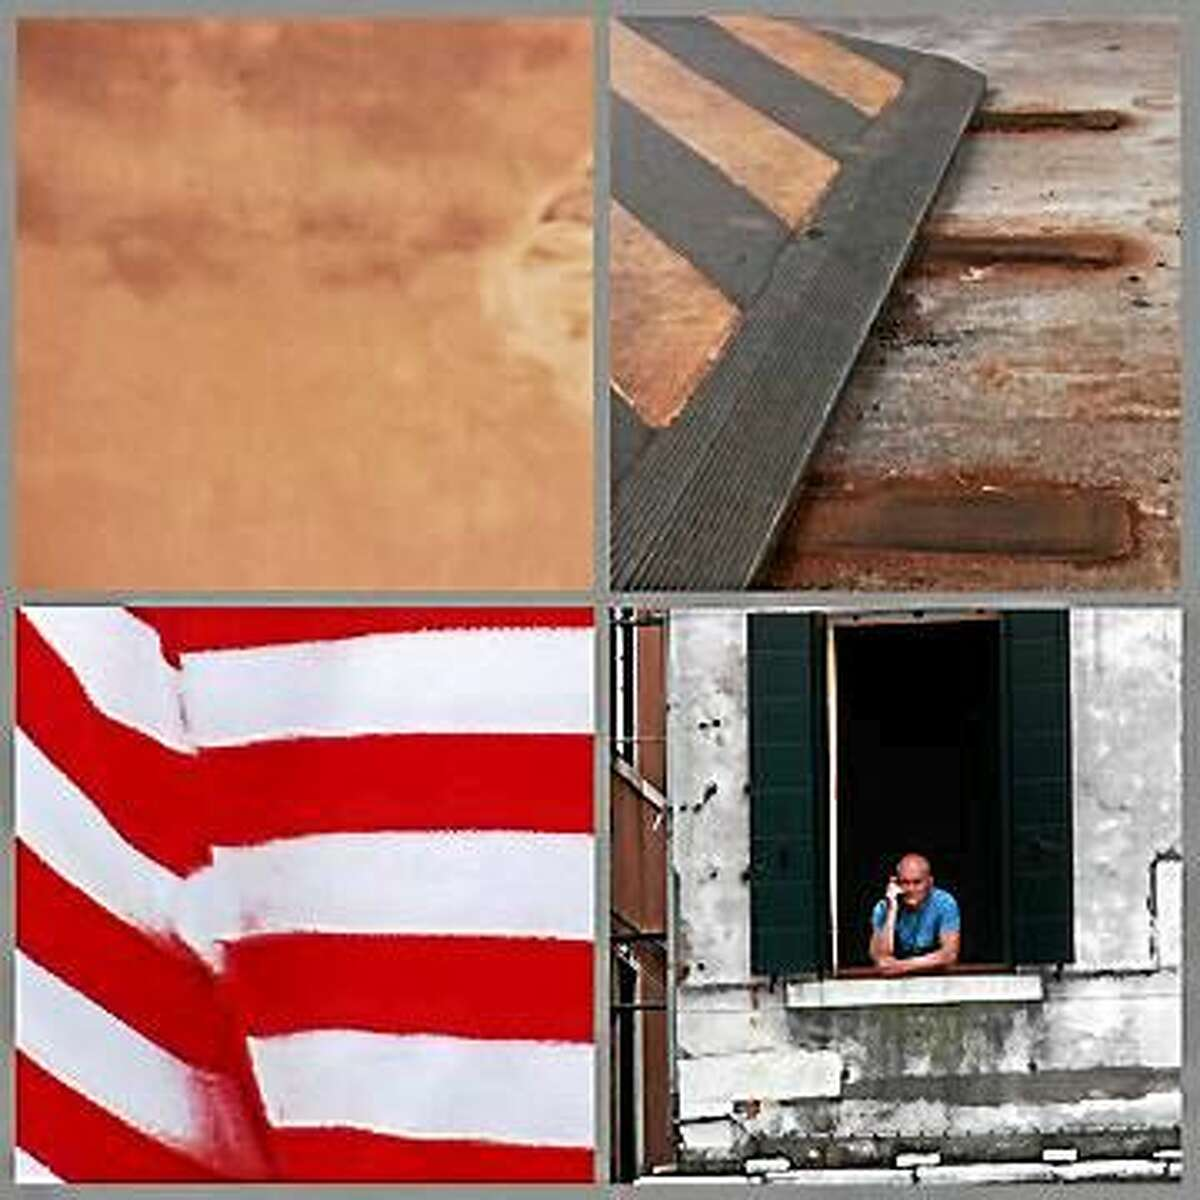 Gene Gort, Venetian, an installation, video stills and archival prints, size variable, 2013-15